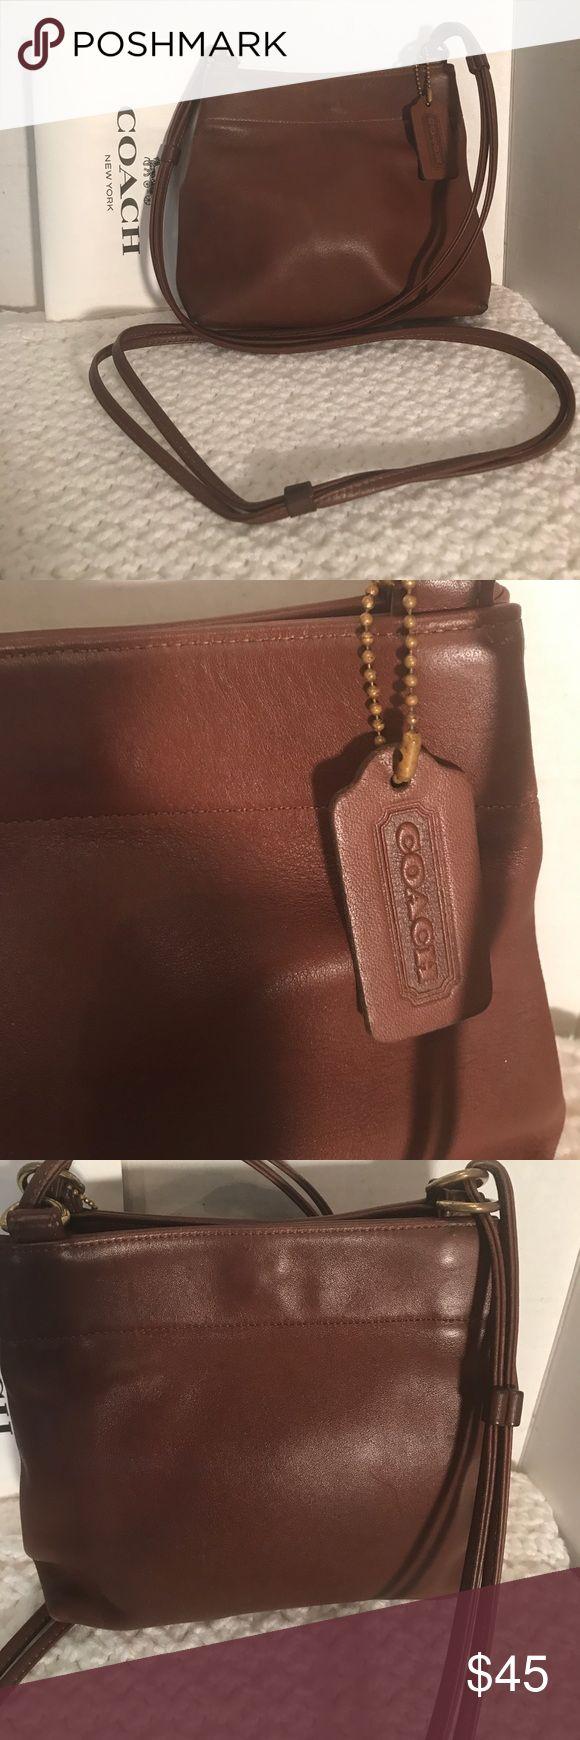 2a722ddecf ... ireland the 25 best coach bags usa ideas on pinterest burberry bag  cf888 a9d4e